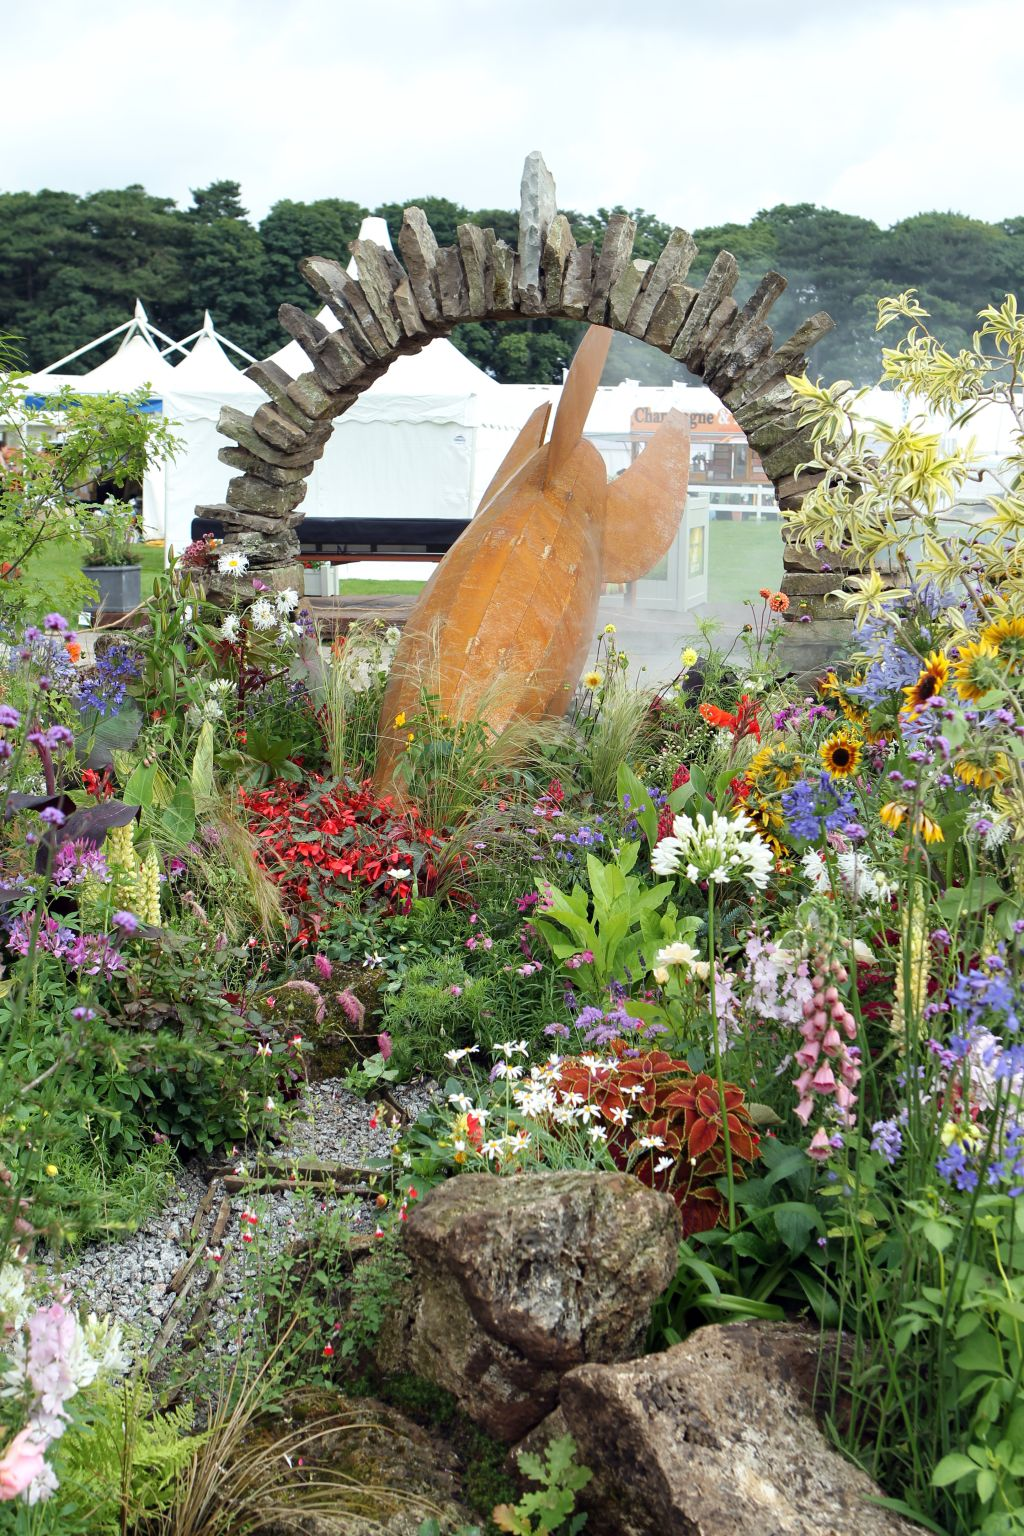 Calatorie interplanetara, proiect de Tatton Park Garden la RHS Flower Show Tatton Park, Londra. Foto Andy Paradise